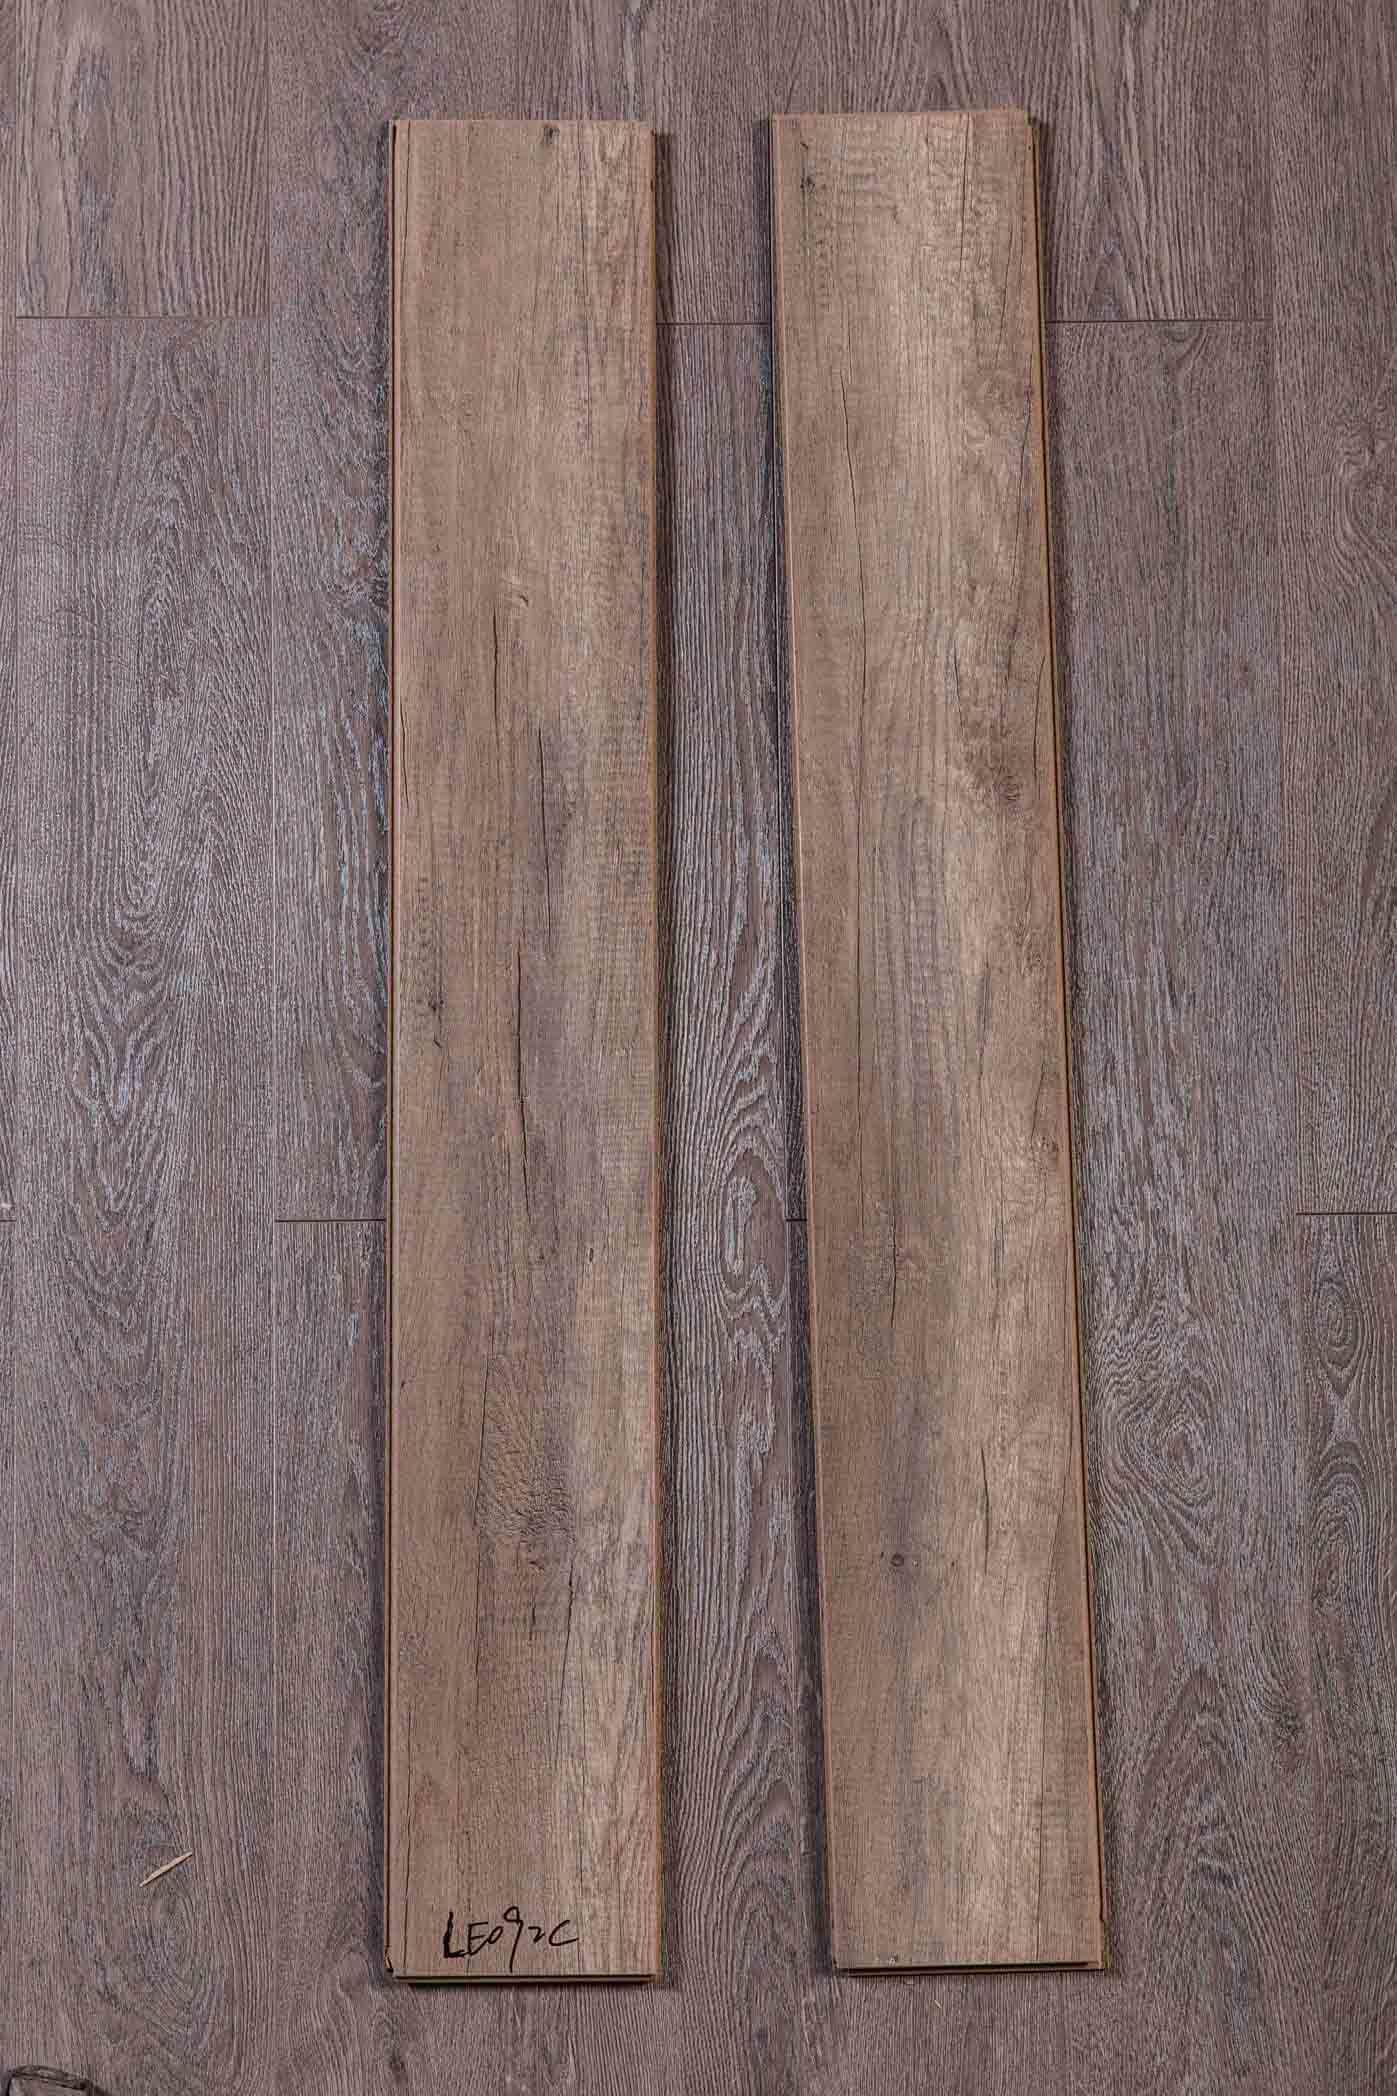 China Lodgi High Quality Laminate Flooring Le092c